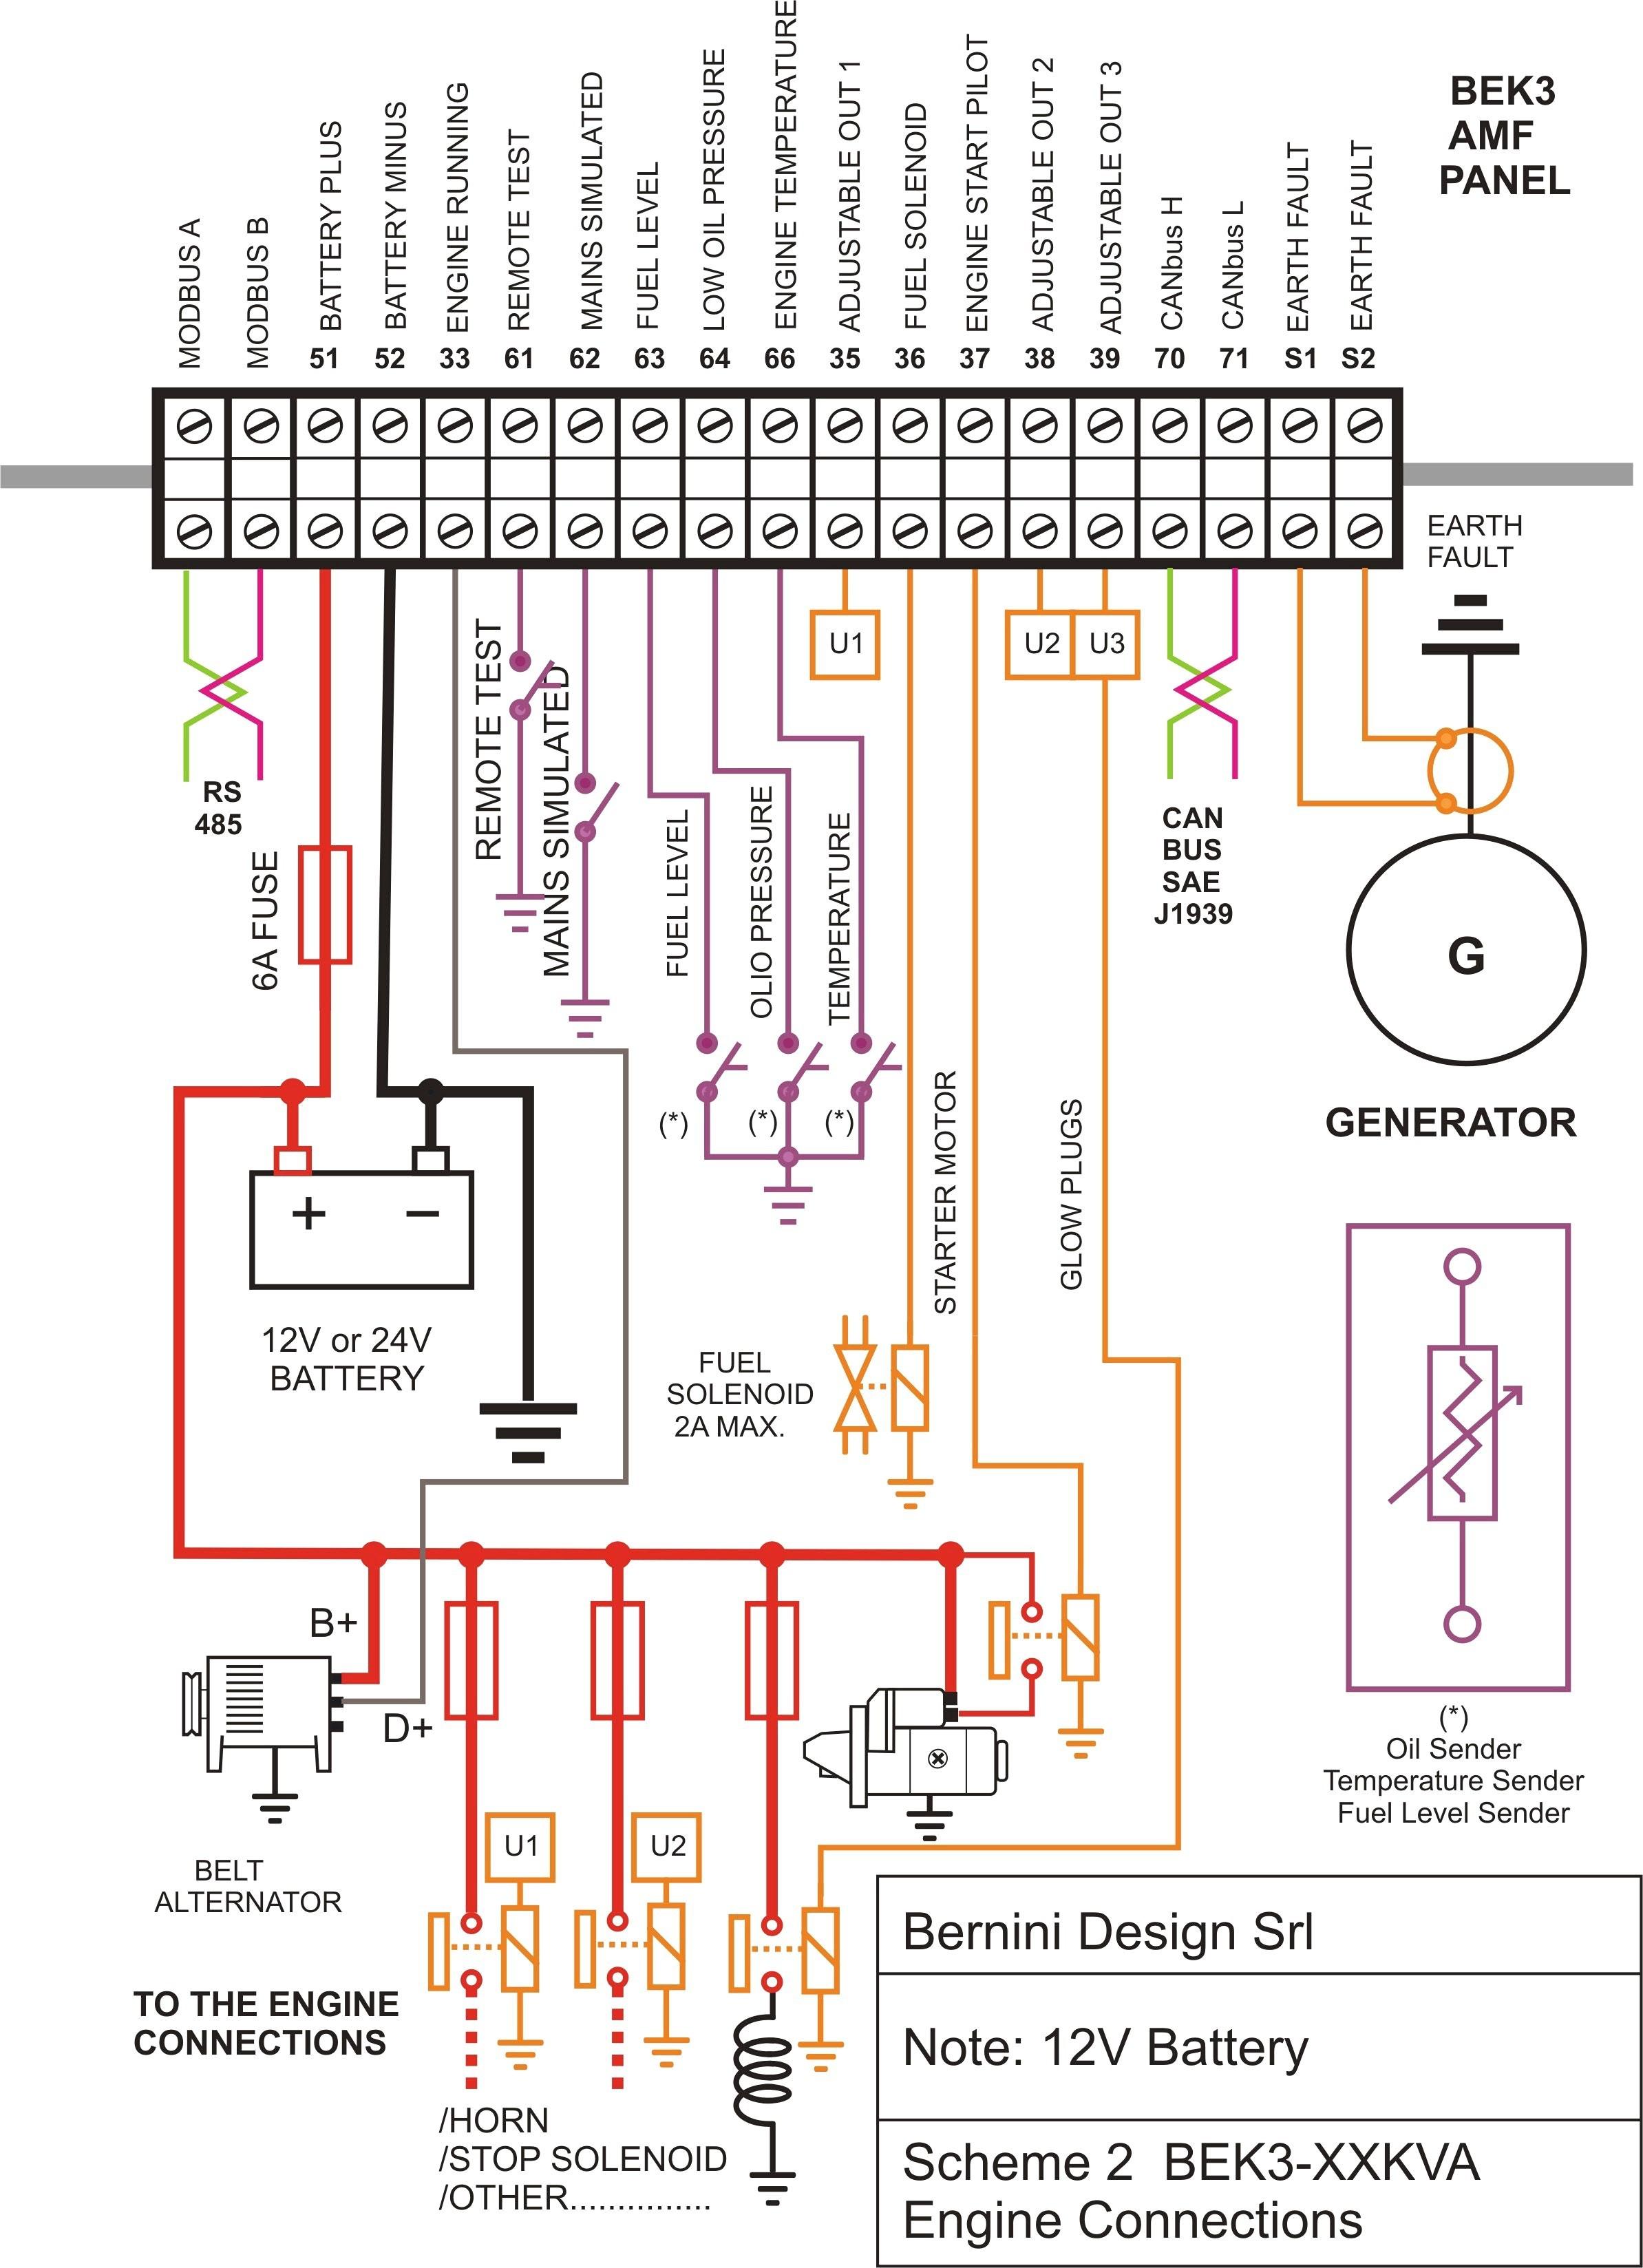 Basic Home Wiring Diagrams Inspirational Free Wiring Diagram software Diagram Of Basic Home Wiring Diagrams